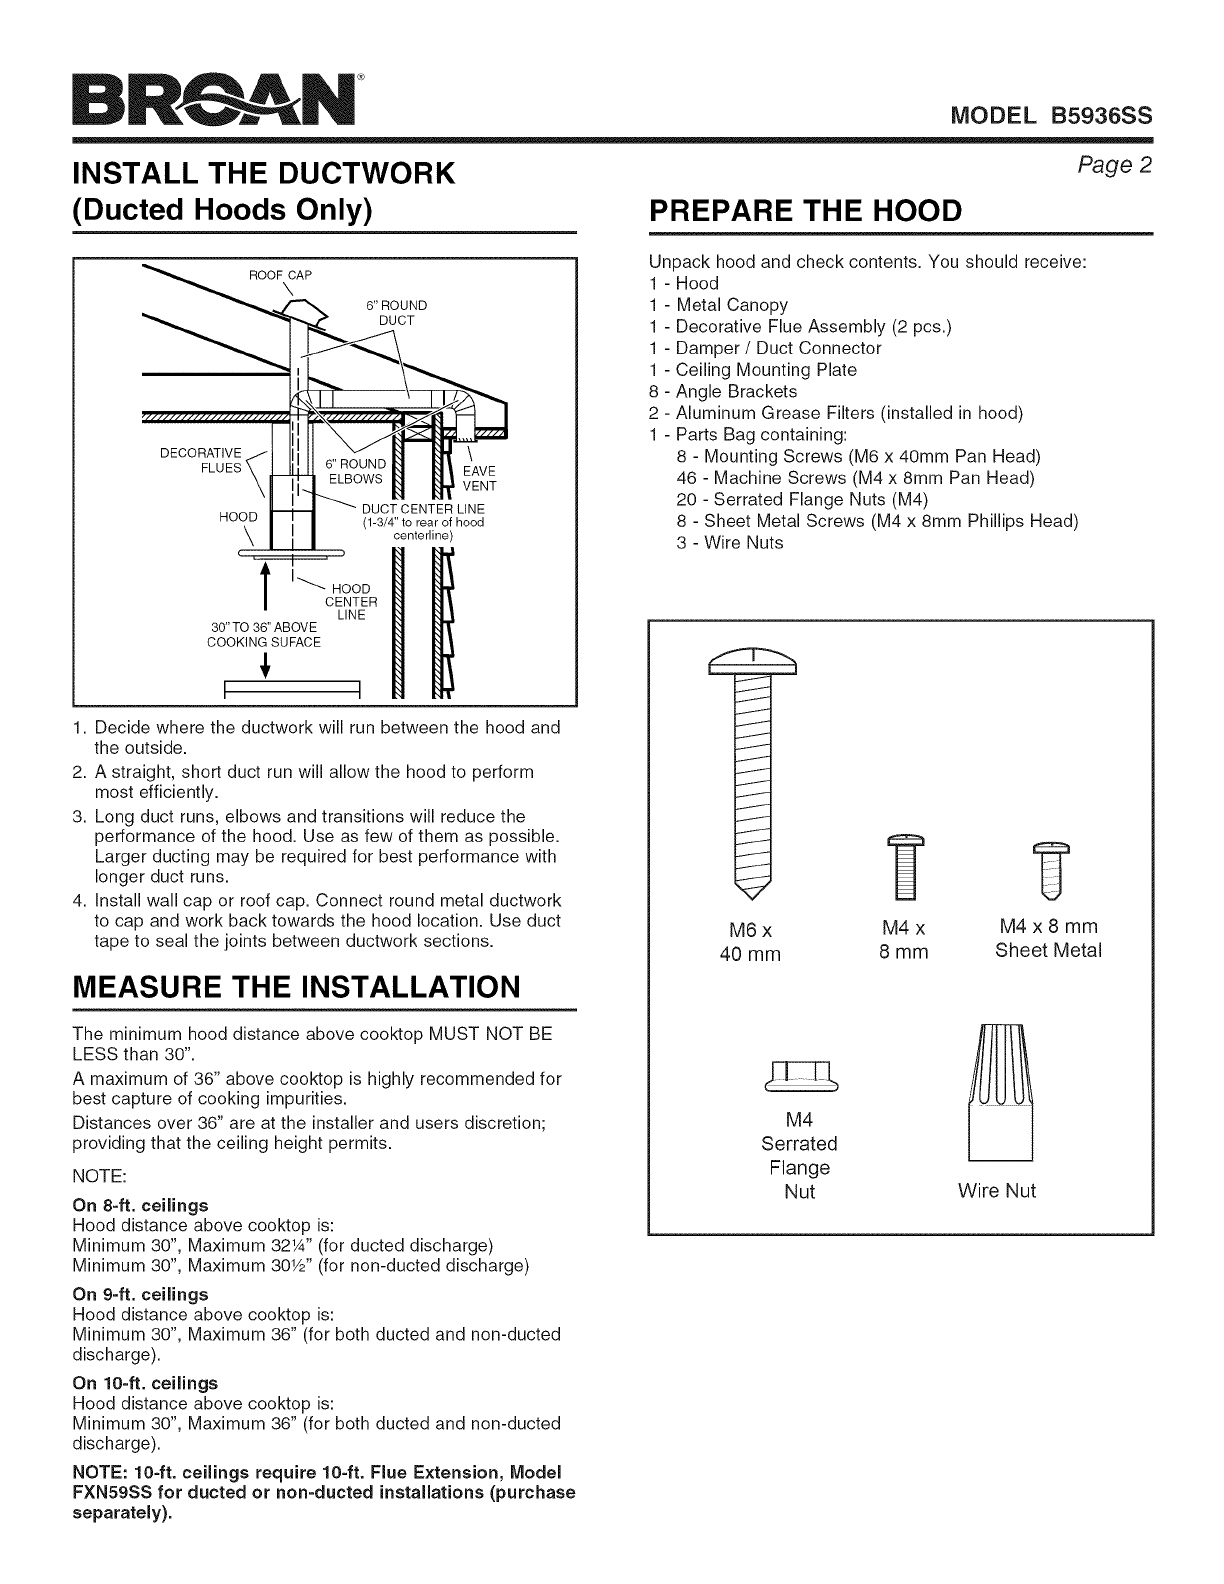 Broan B5936SS User Manual RANGE HOOD Manuals And Guides 1508073L